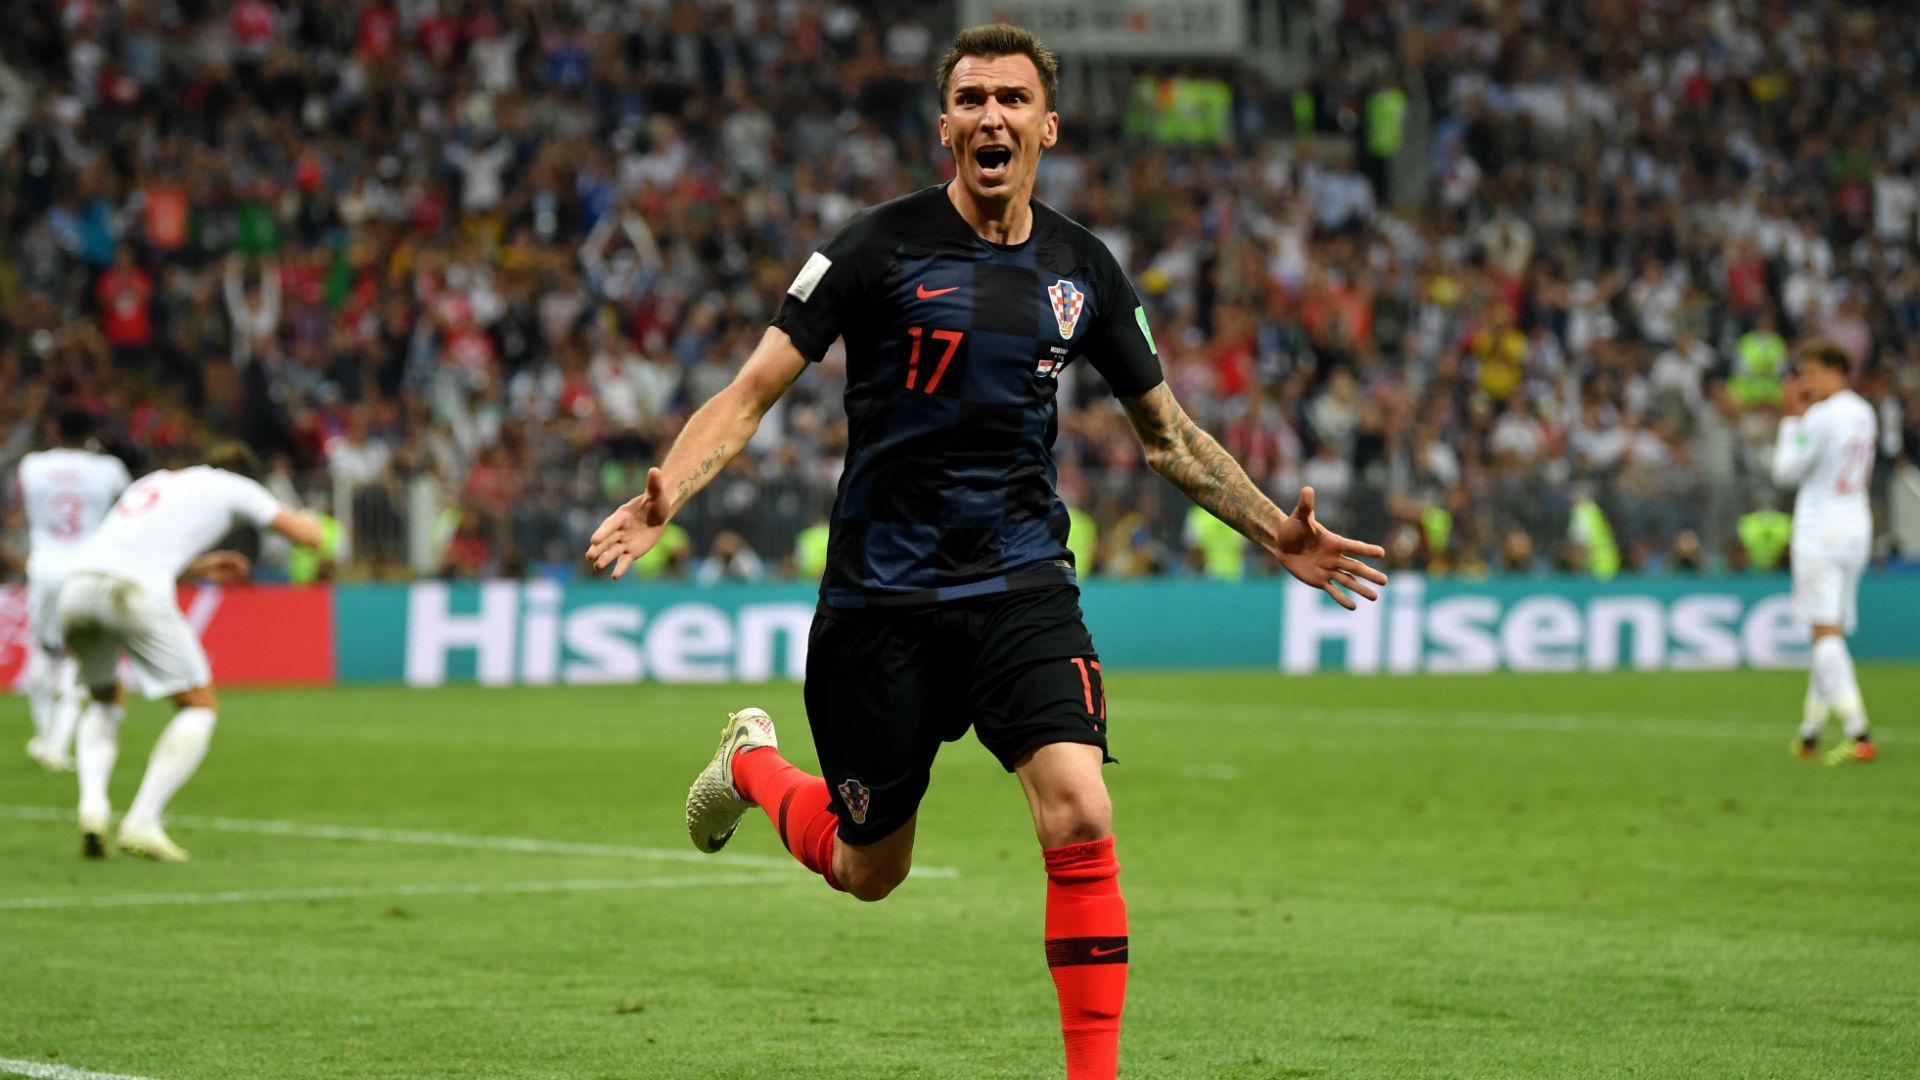 croatia england - mario mandzukic goal - world cup - 11072018